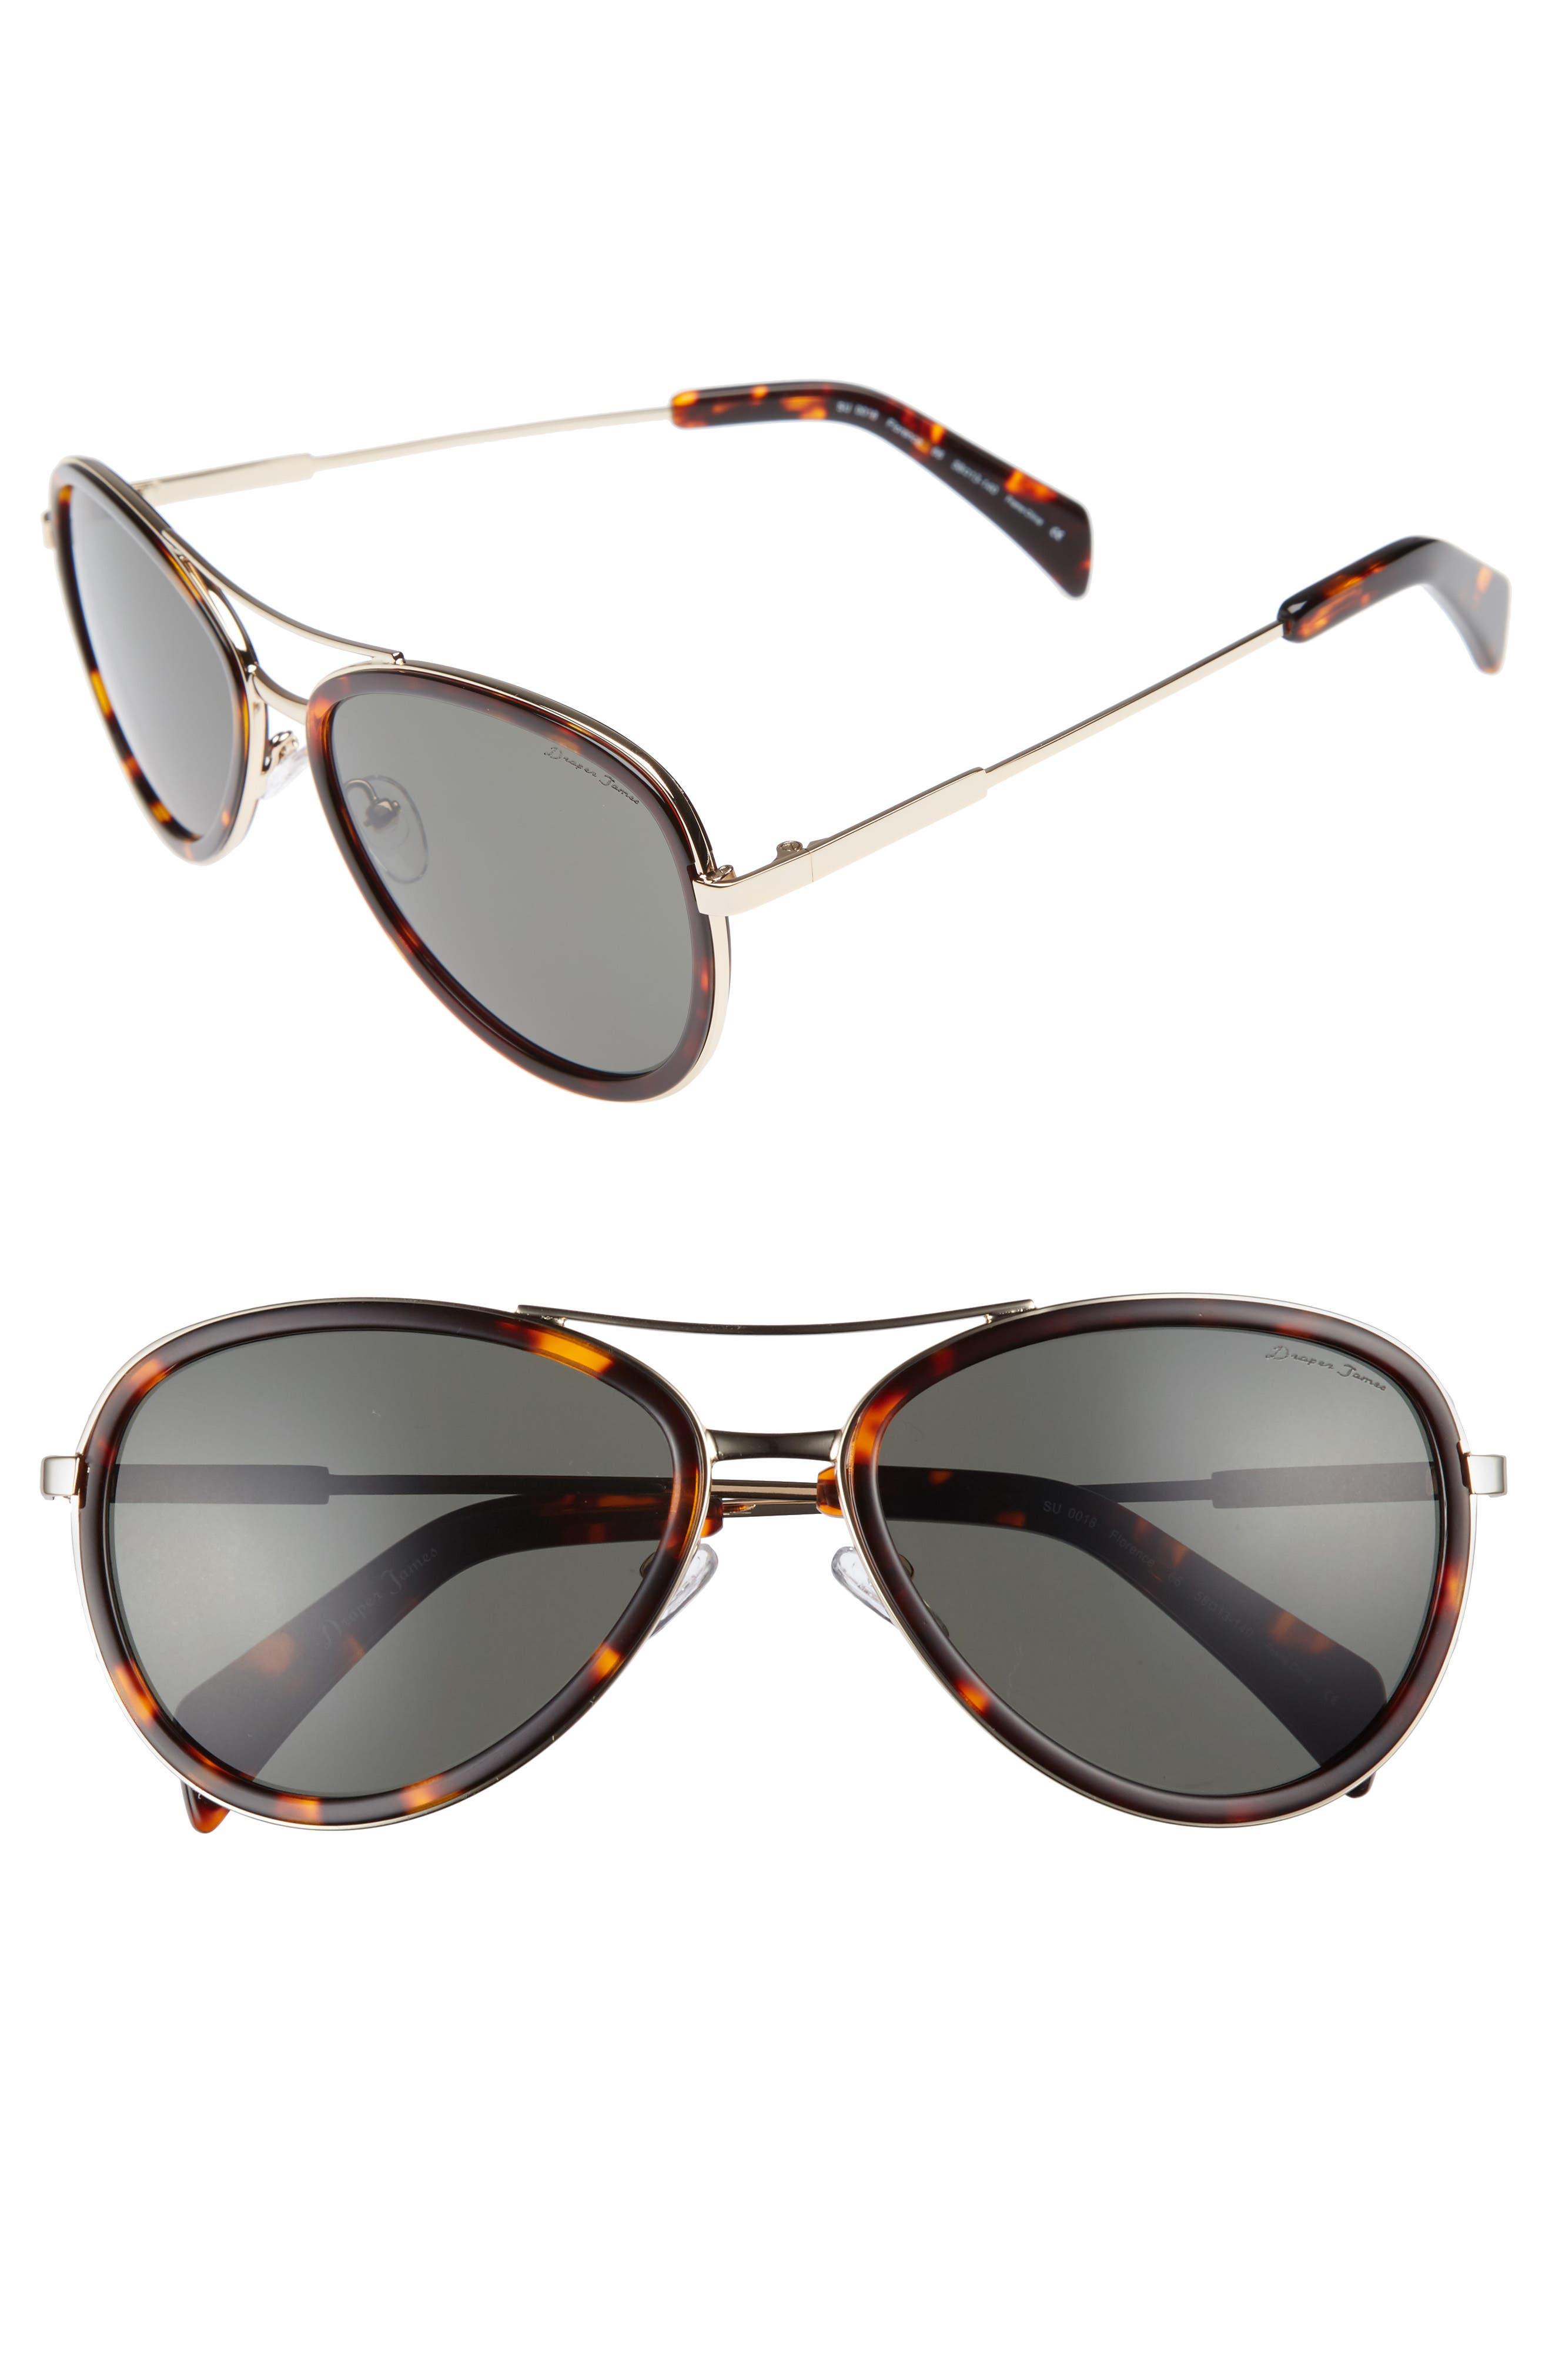 DRAPER JAMES 58Mm Aviator Sunglasses - Gold